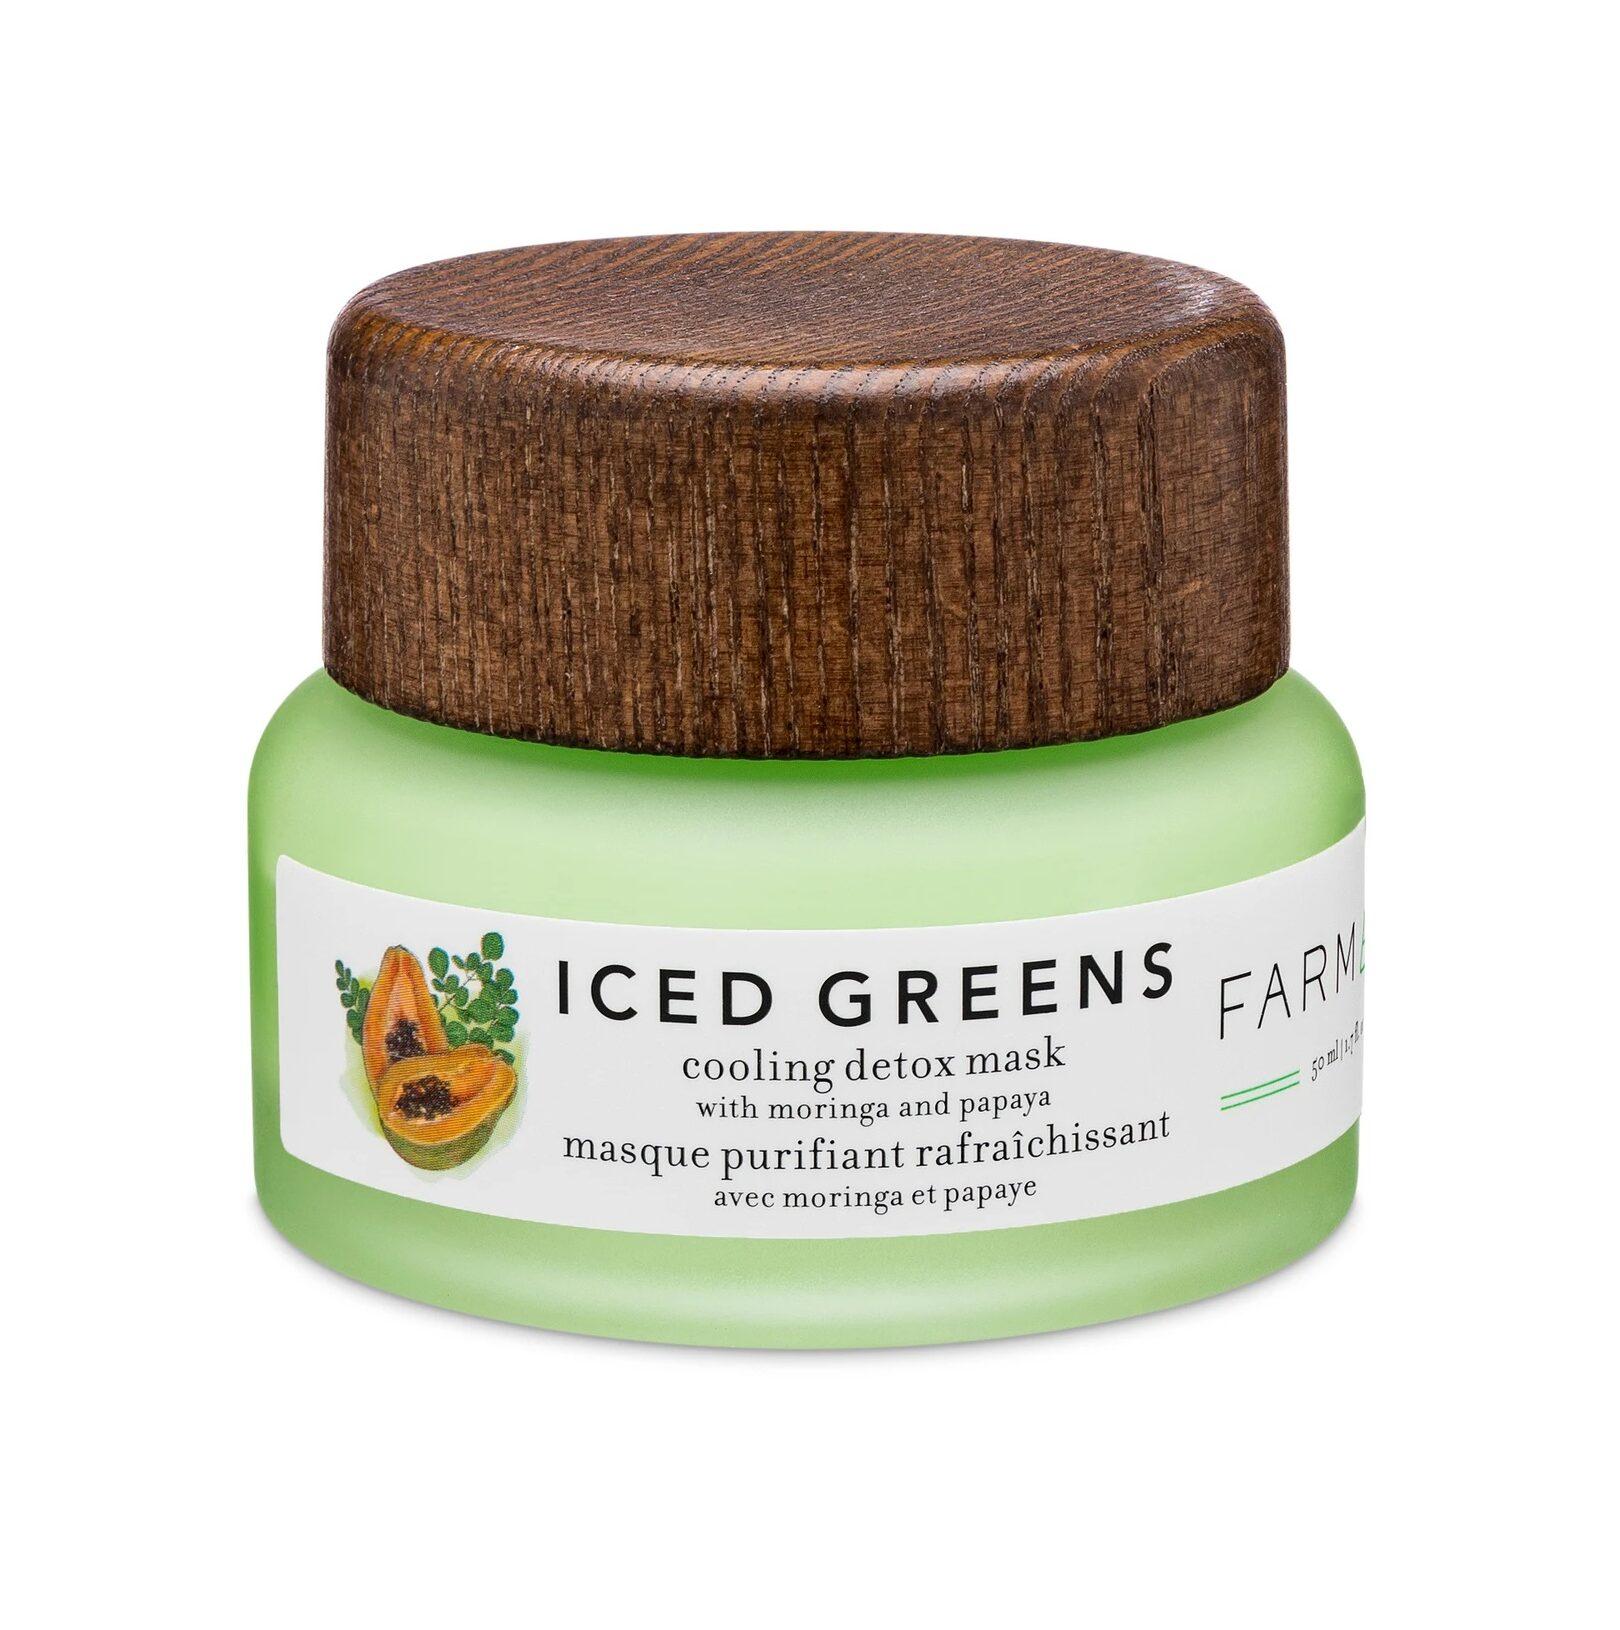 Farmacy Beauty Iced Greens Cooling Detox Mask